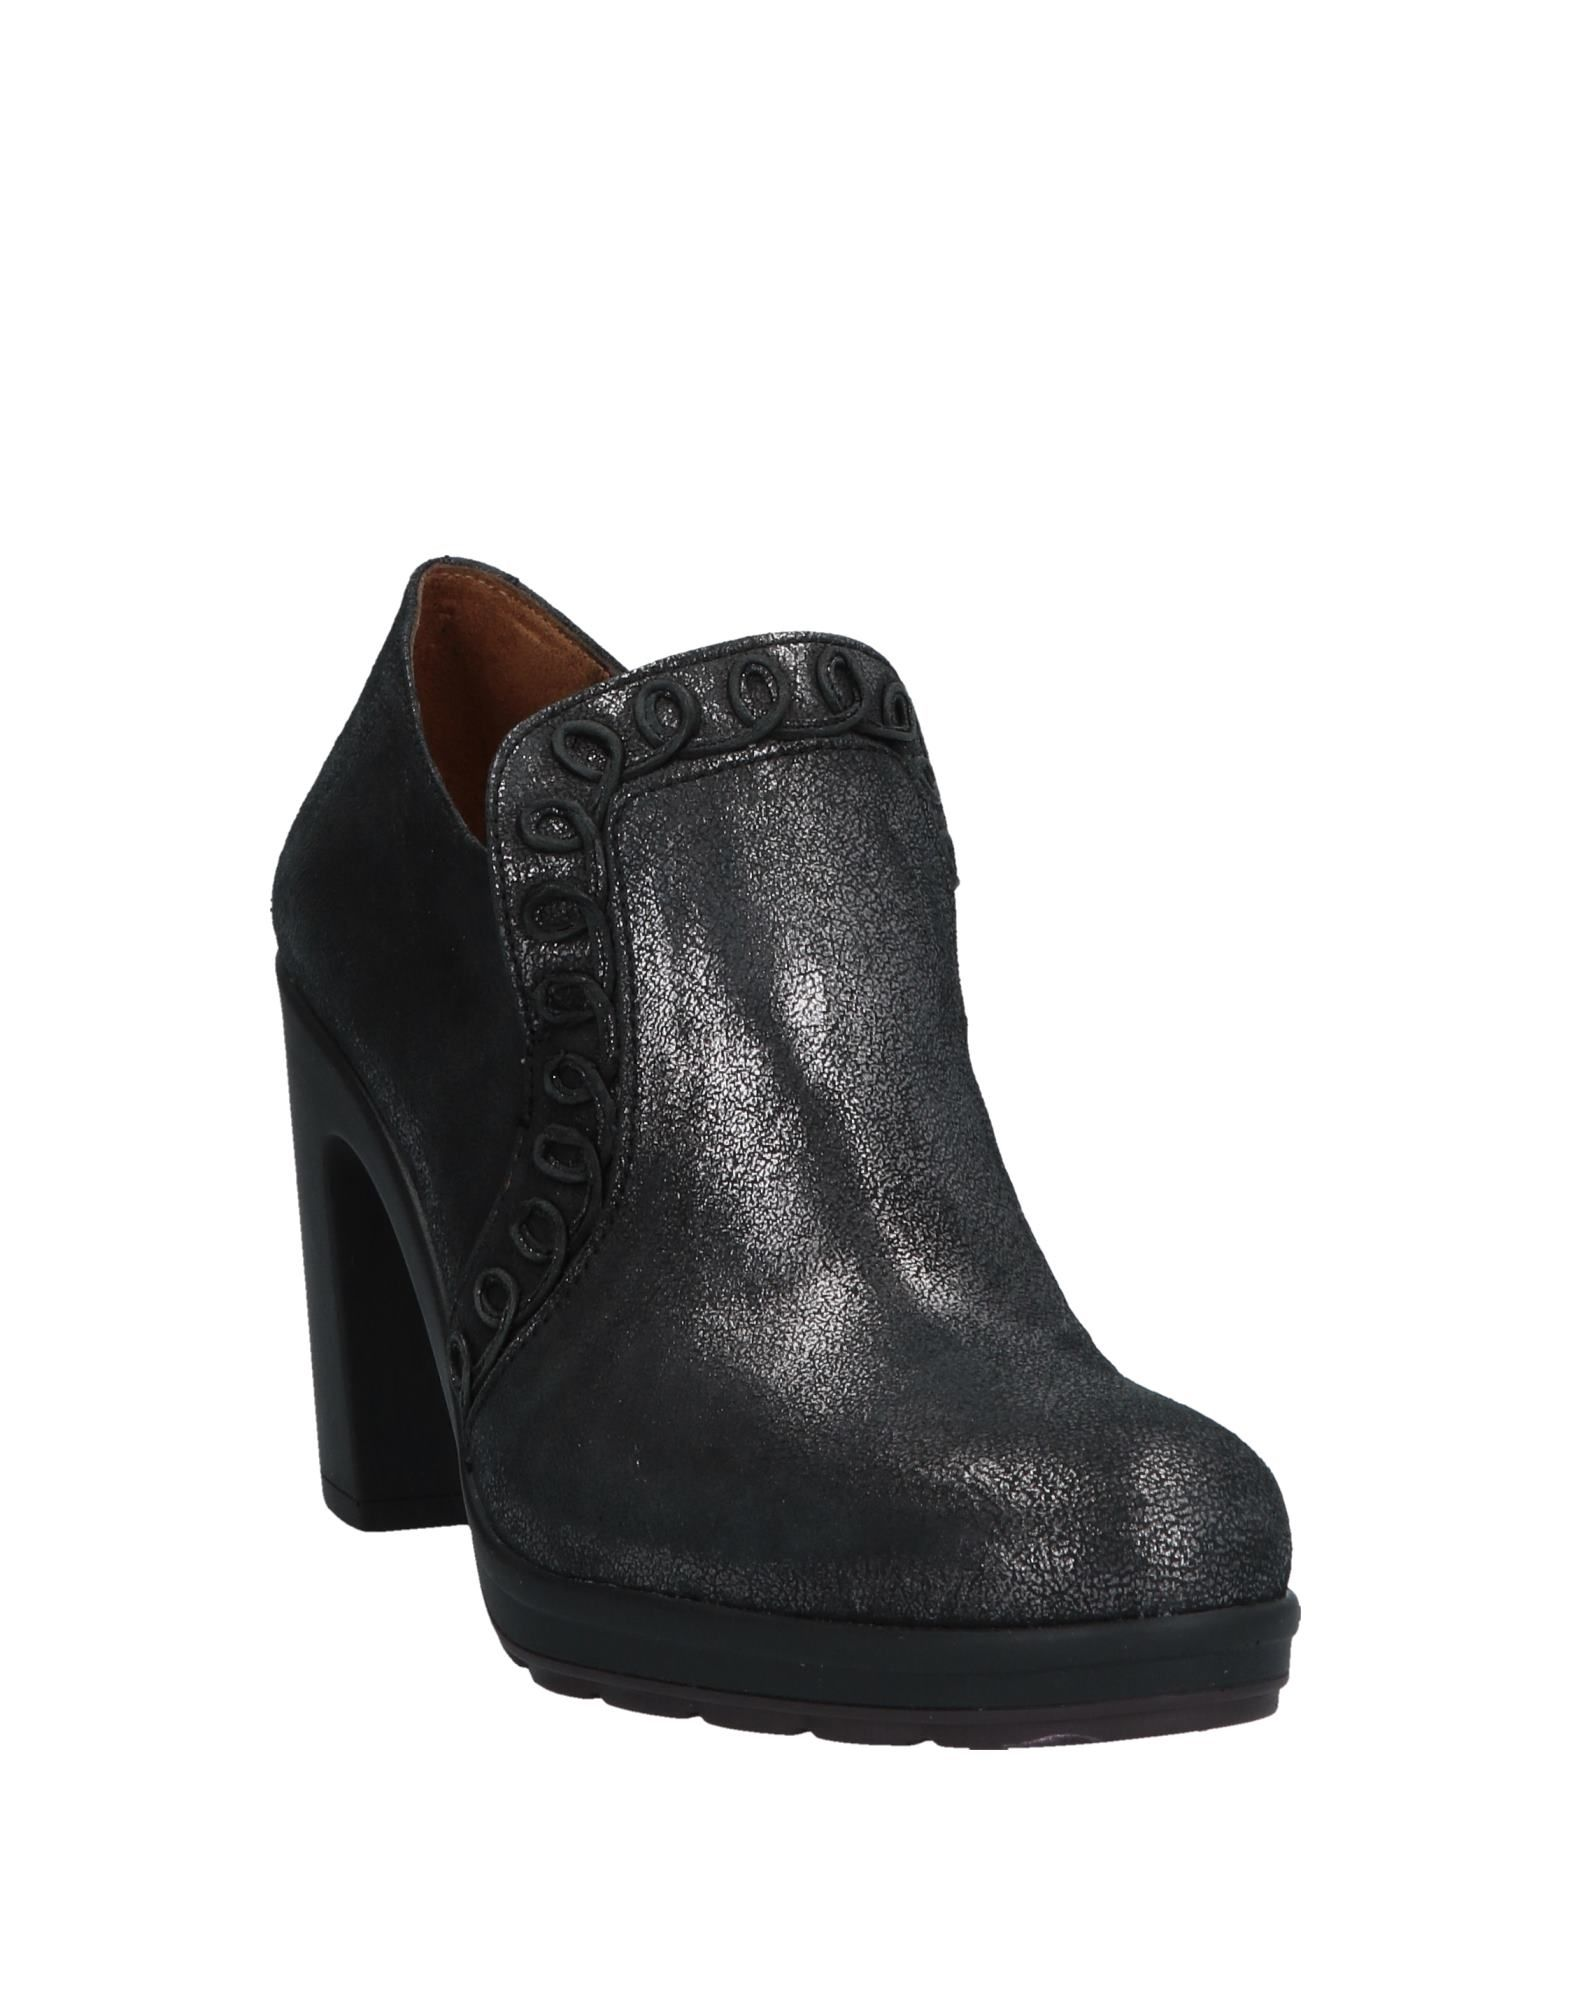 Stilvolle billige Schuhe Damen Pons Quintana Stiefelette Damen Schuhe  11556335SV d406e0